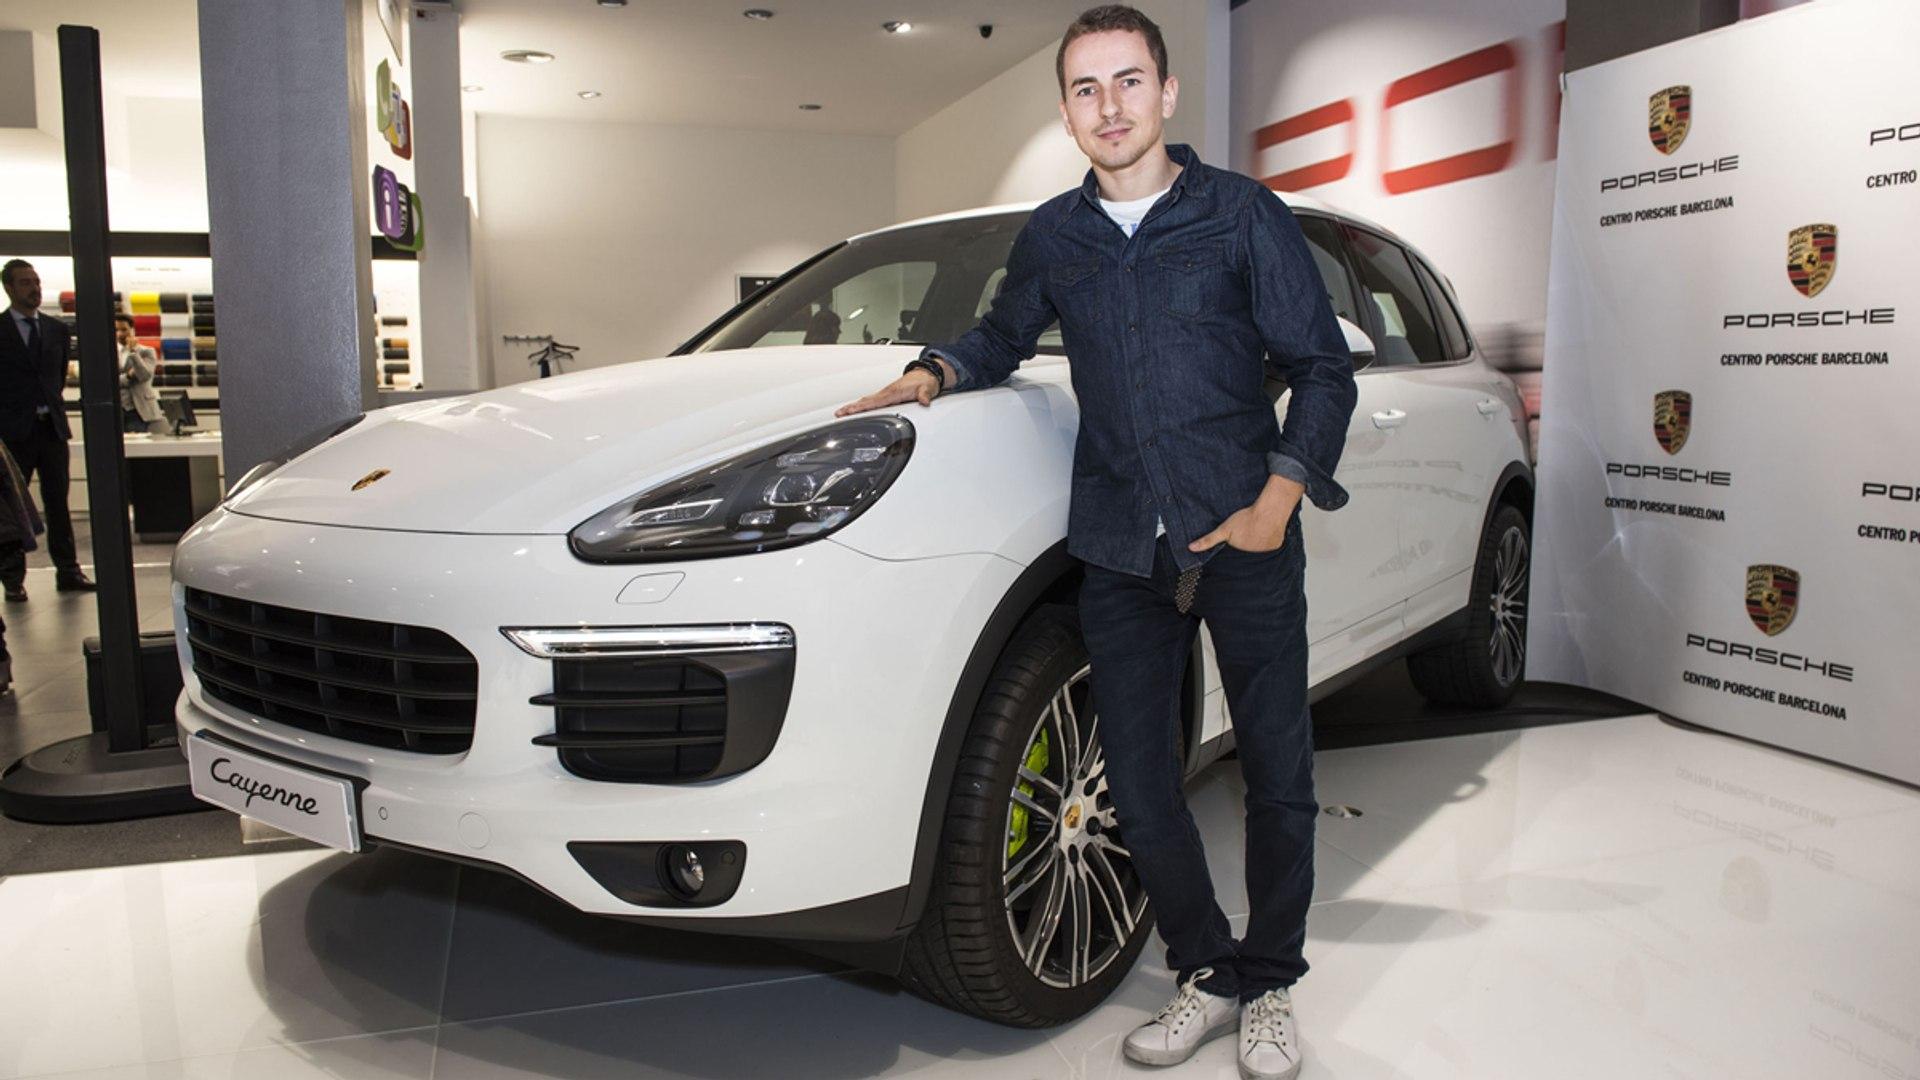 El nuevo Porsche Cayenne de Jorge Lorenzo - Vídeo Dailymotion